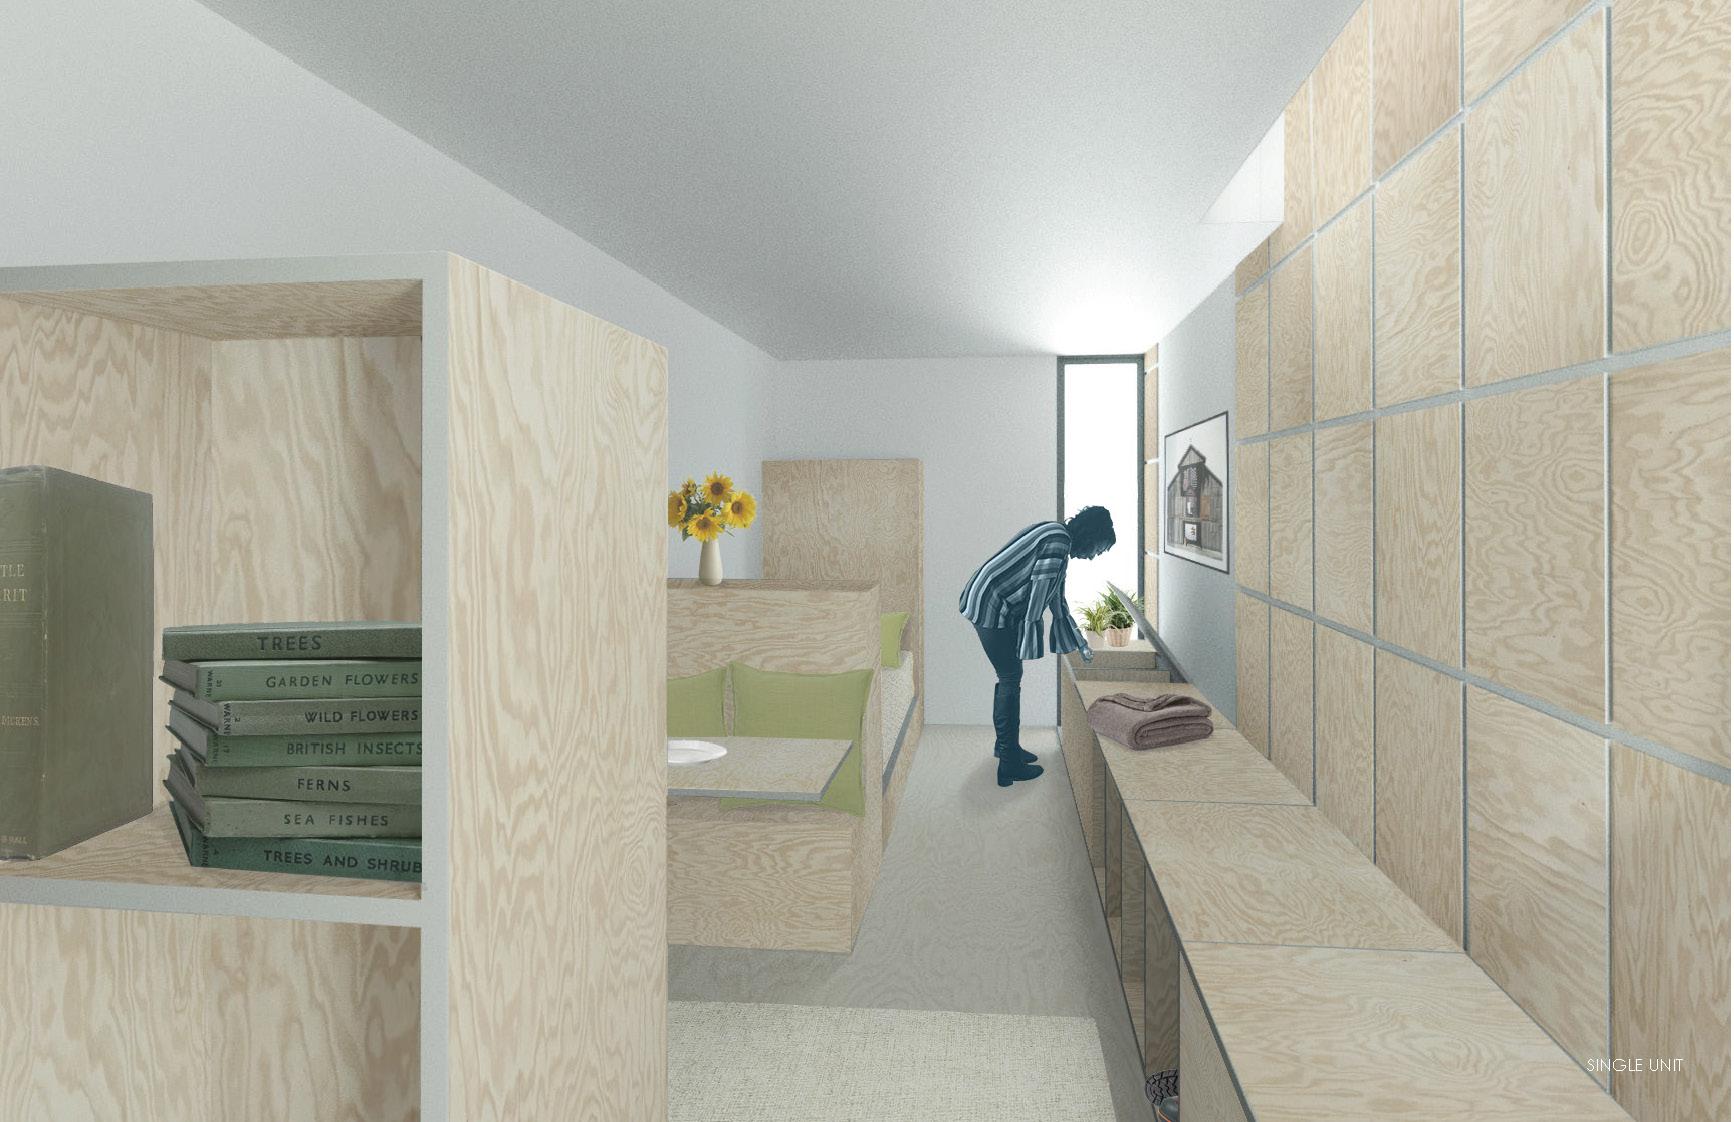 Interior view of living unit